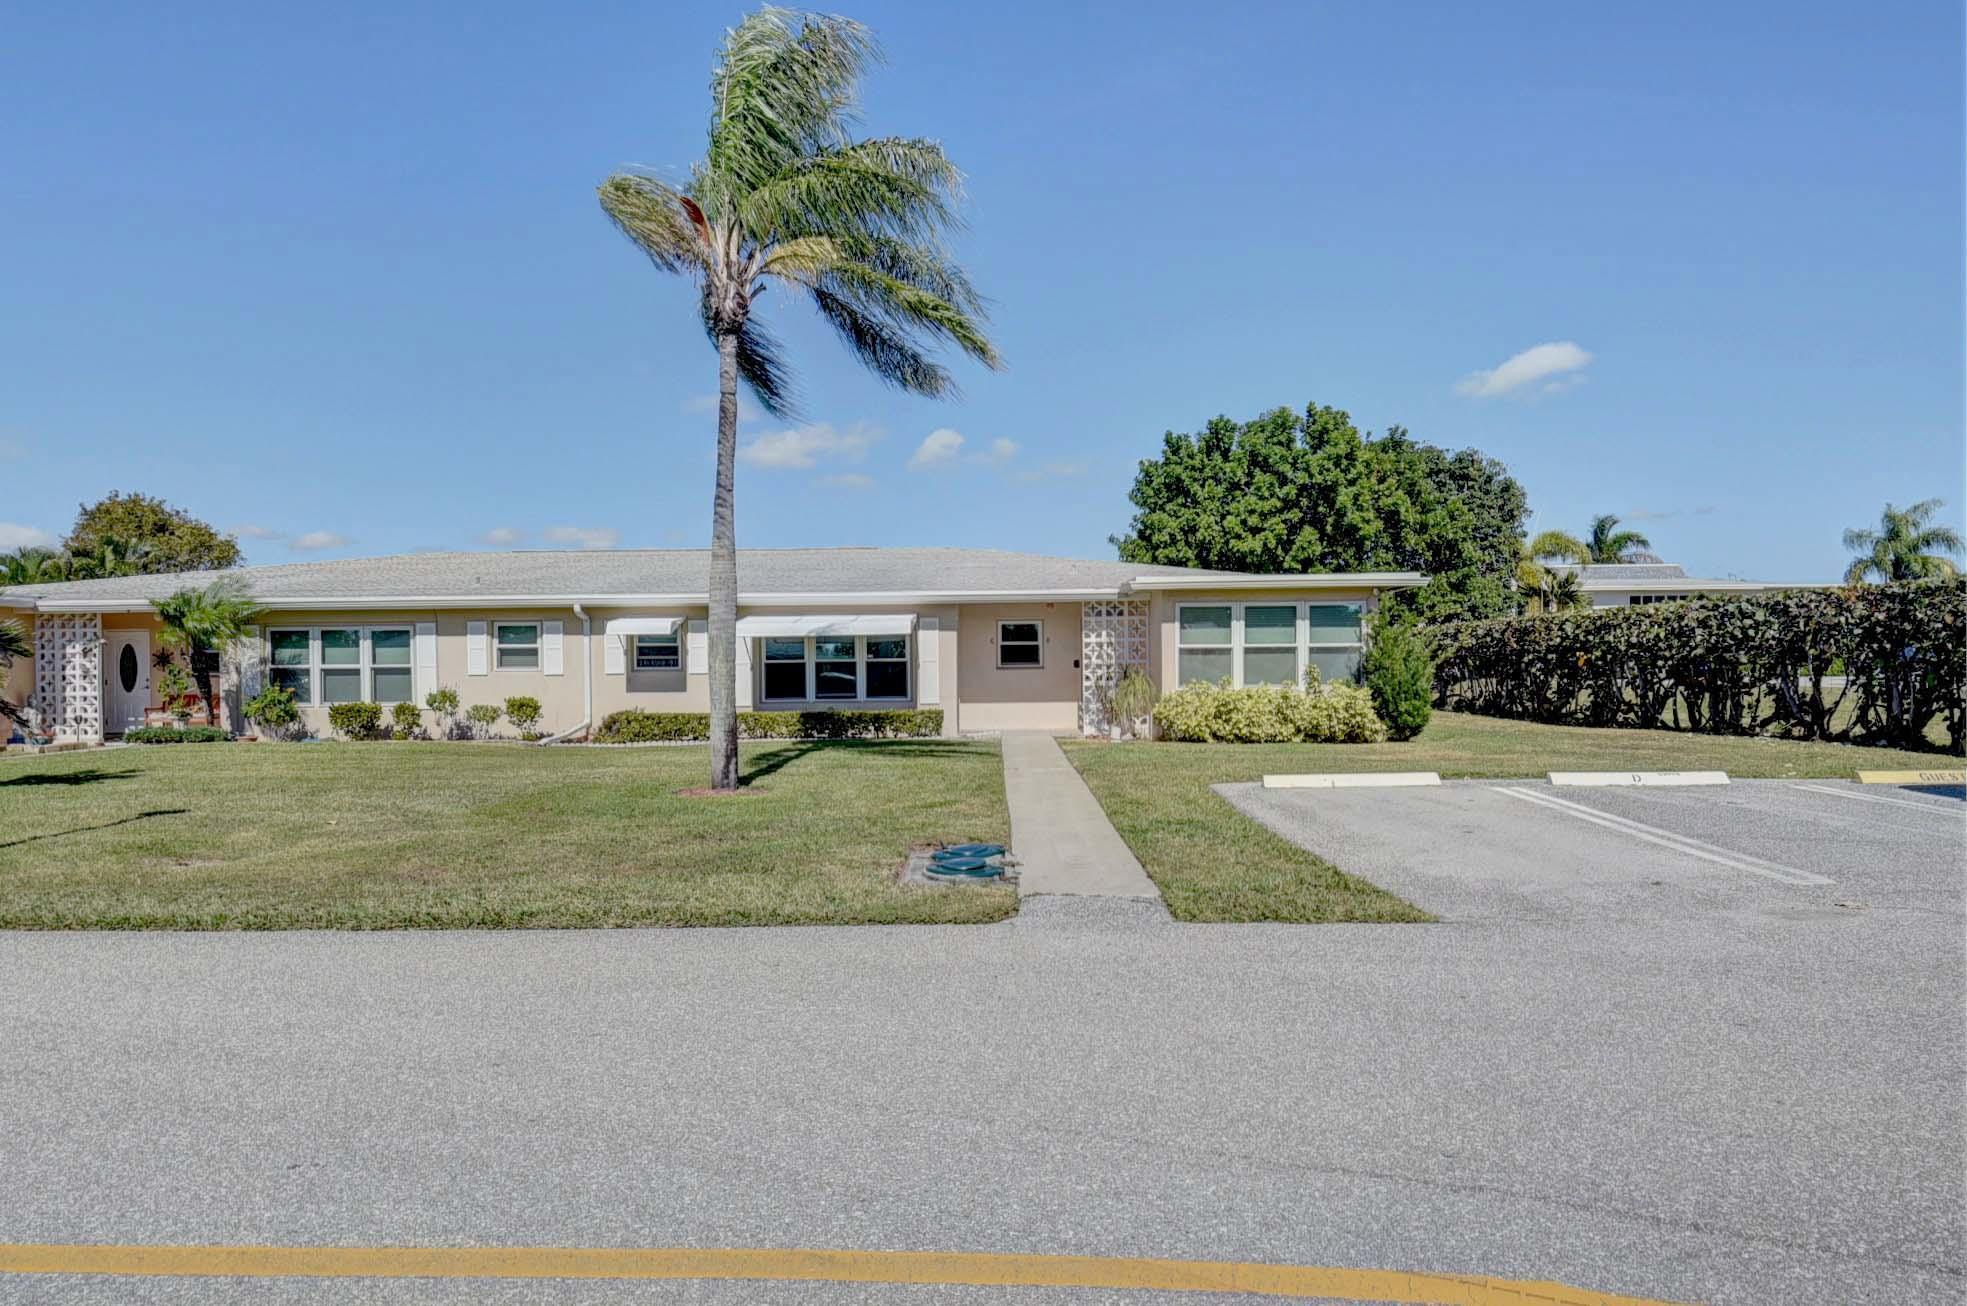 135 N High Point Unit C, Boynton Beach, Florida 33435